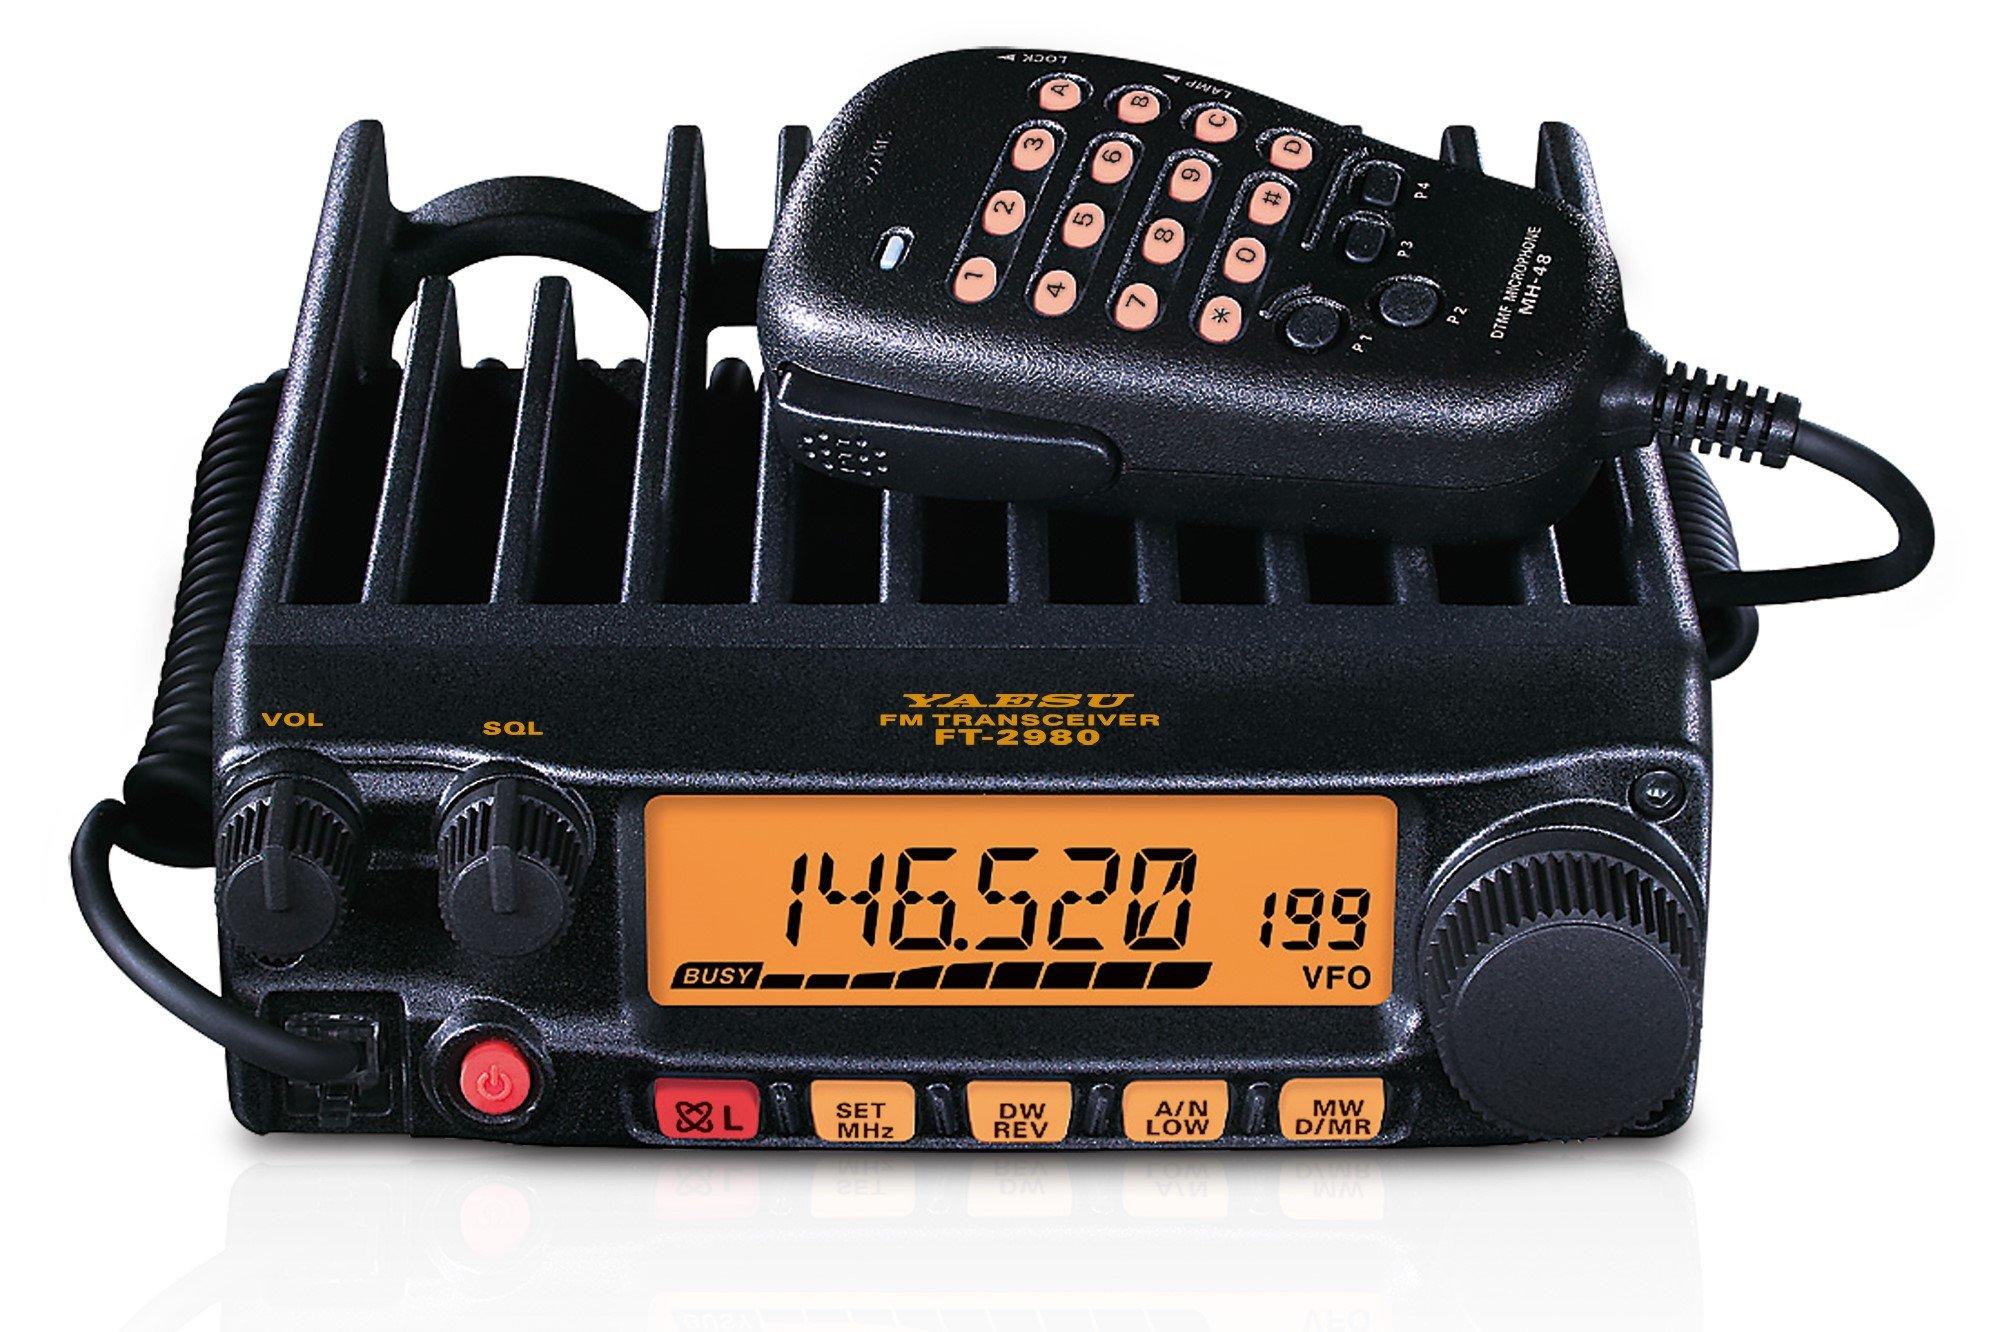 FT-2980R FT-2980 Original Yaesu 144 MHz Single Band Mobile Transceiver 80 Watts - 3 Year Manufacturer Warranty